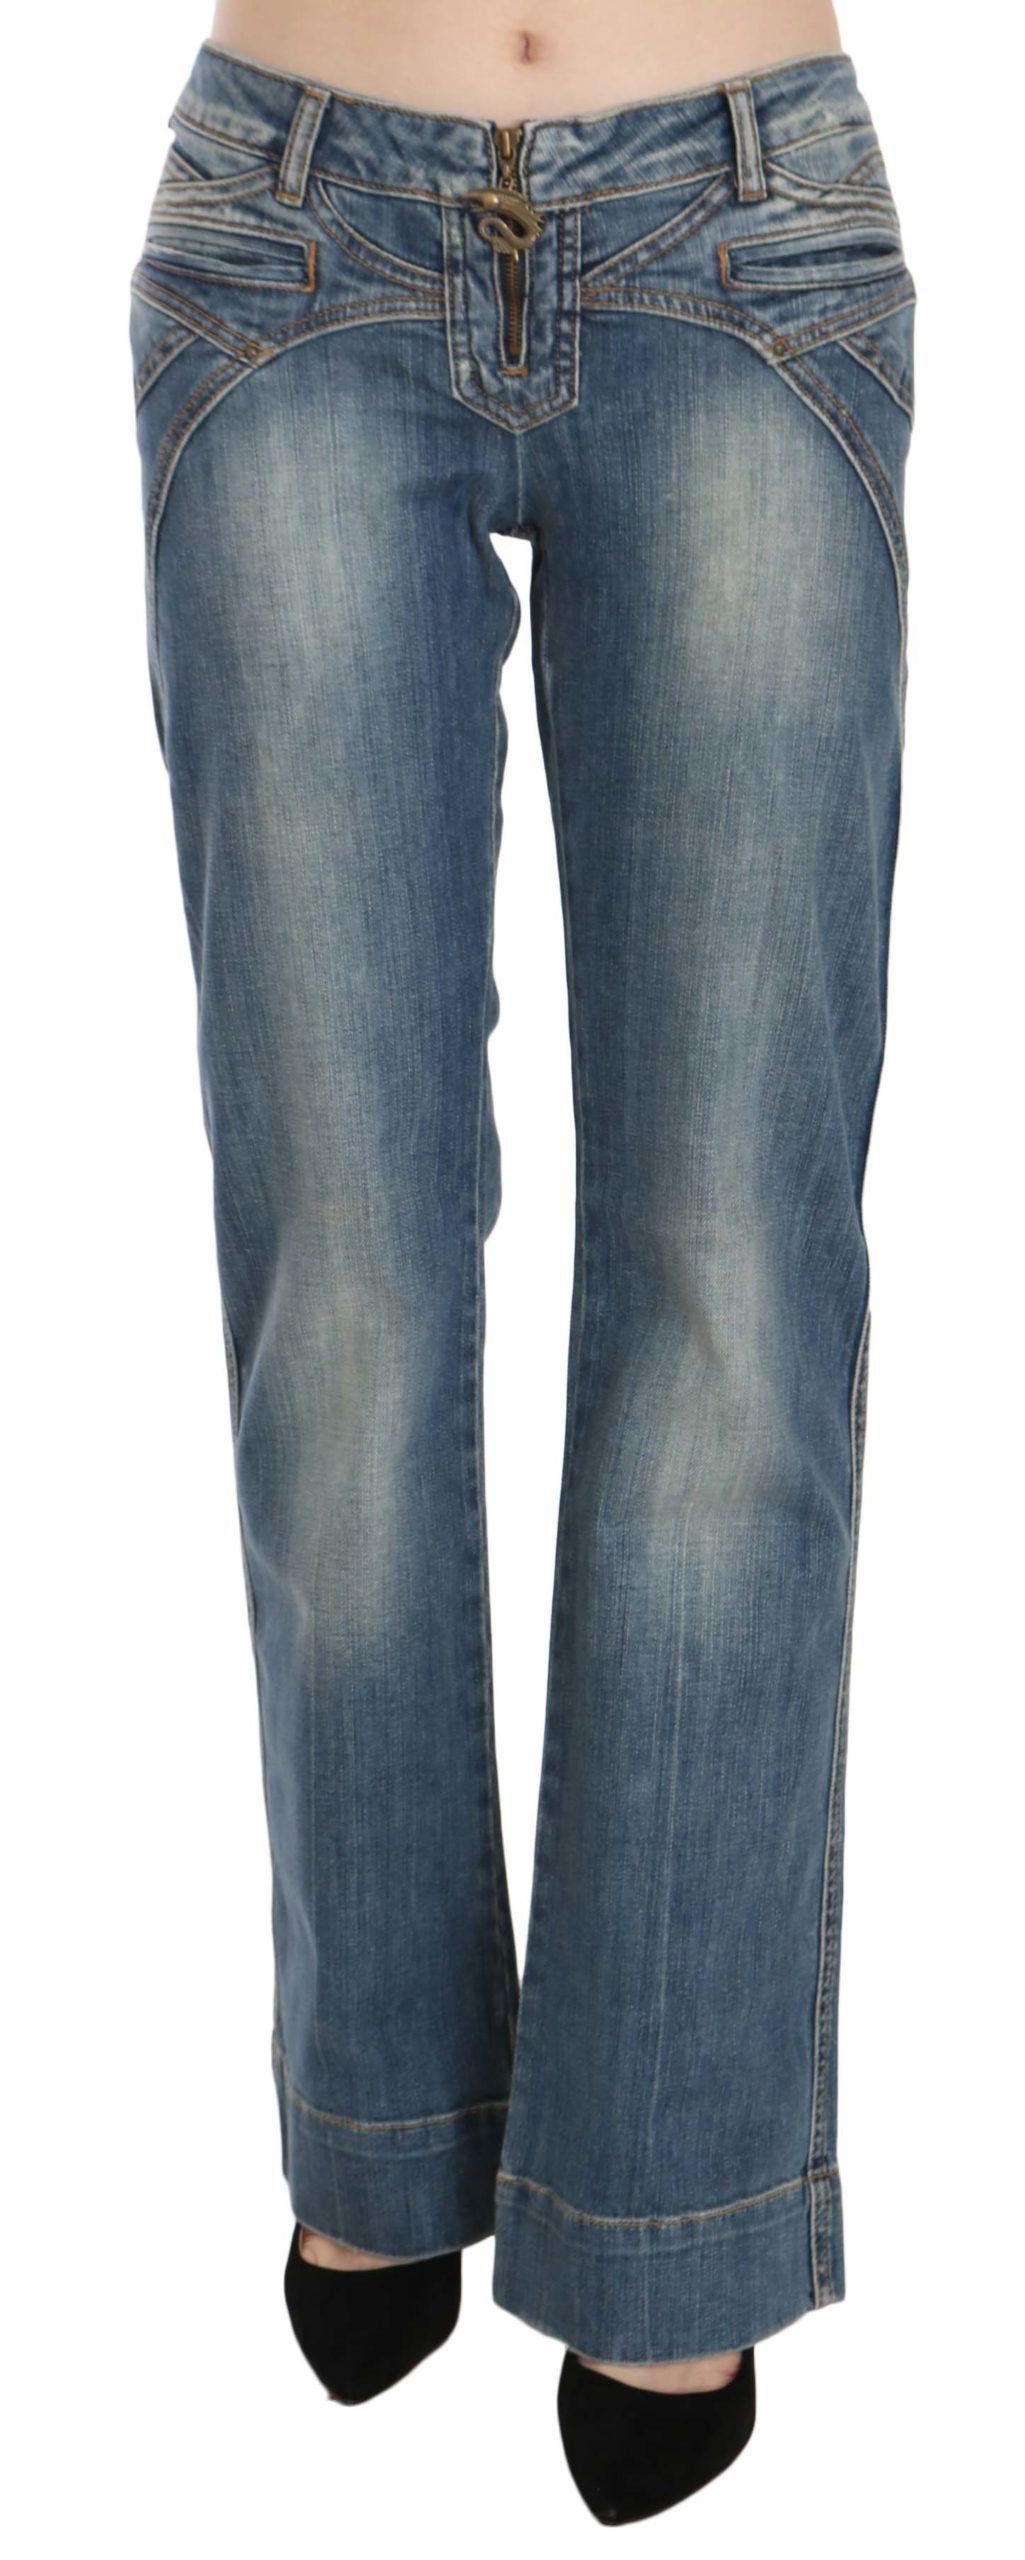 Just Cavalli Blue Washed Low Waist Wide Leg Denim Pants Jeans